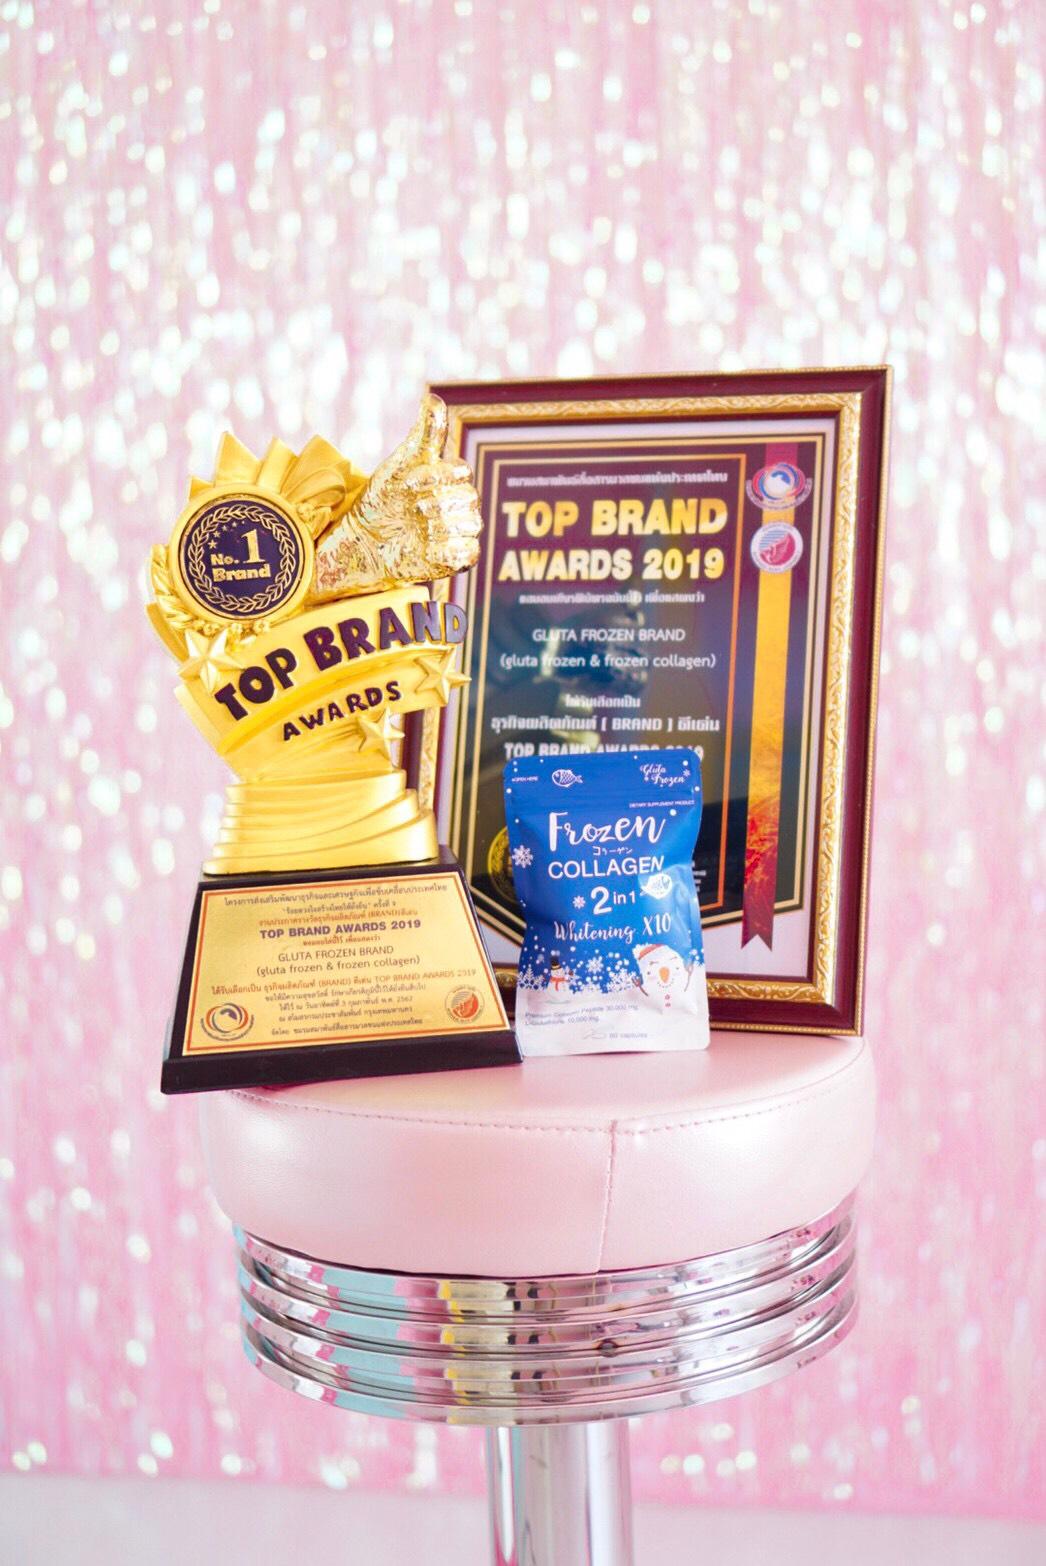 Frozen Collagen Singapore : Top Brands Award 2019 for Beauty